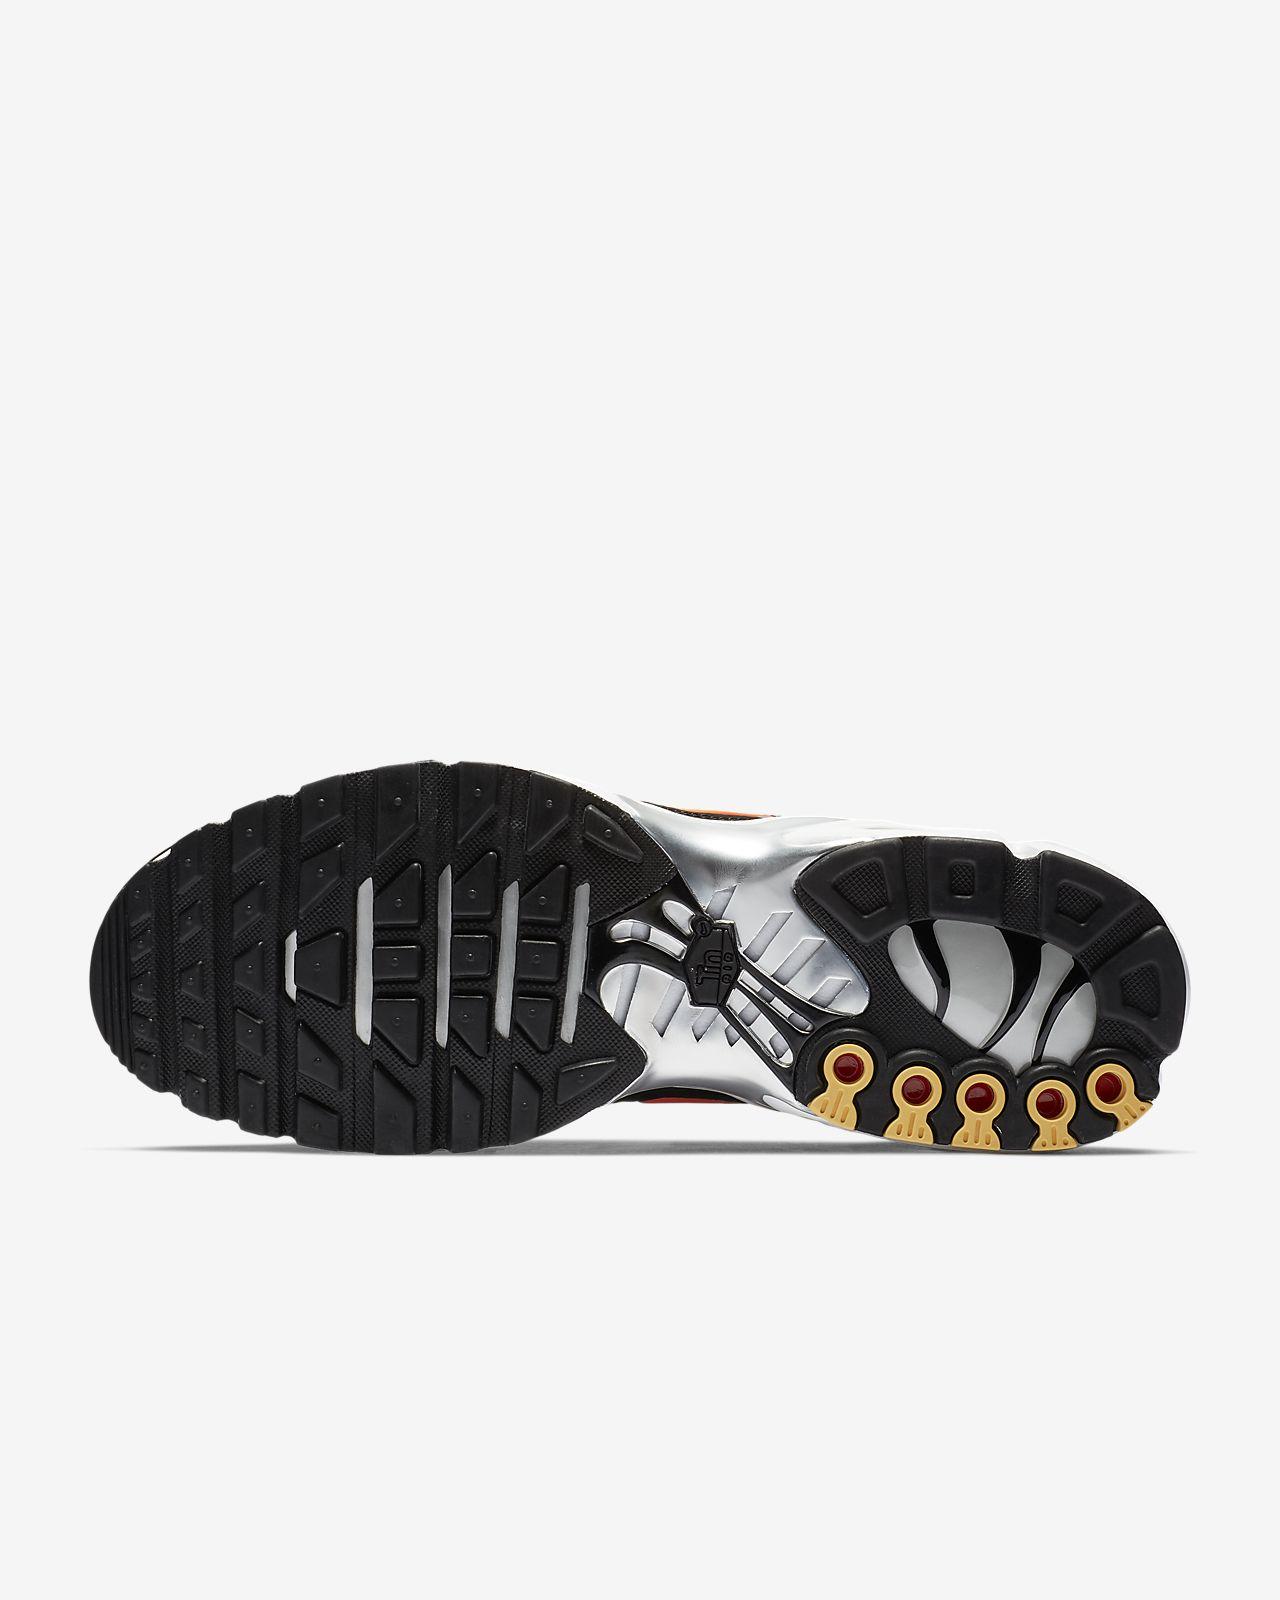 wholesale dealer cb595 3f0b3 ... Calzado para hombre Nike Air Max Plus TN SE